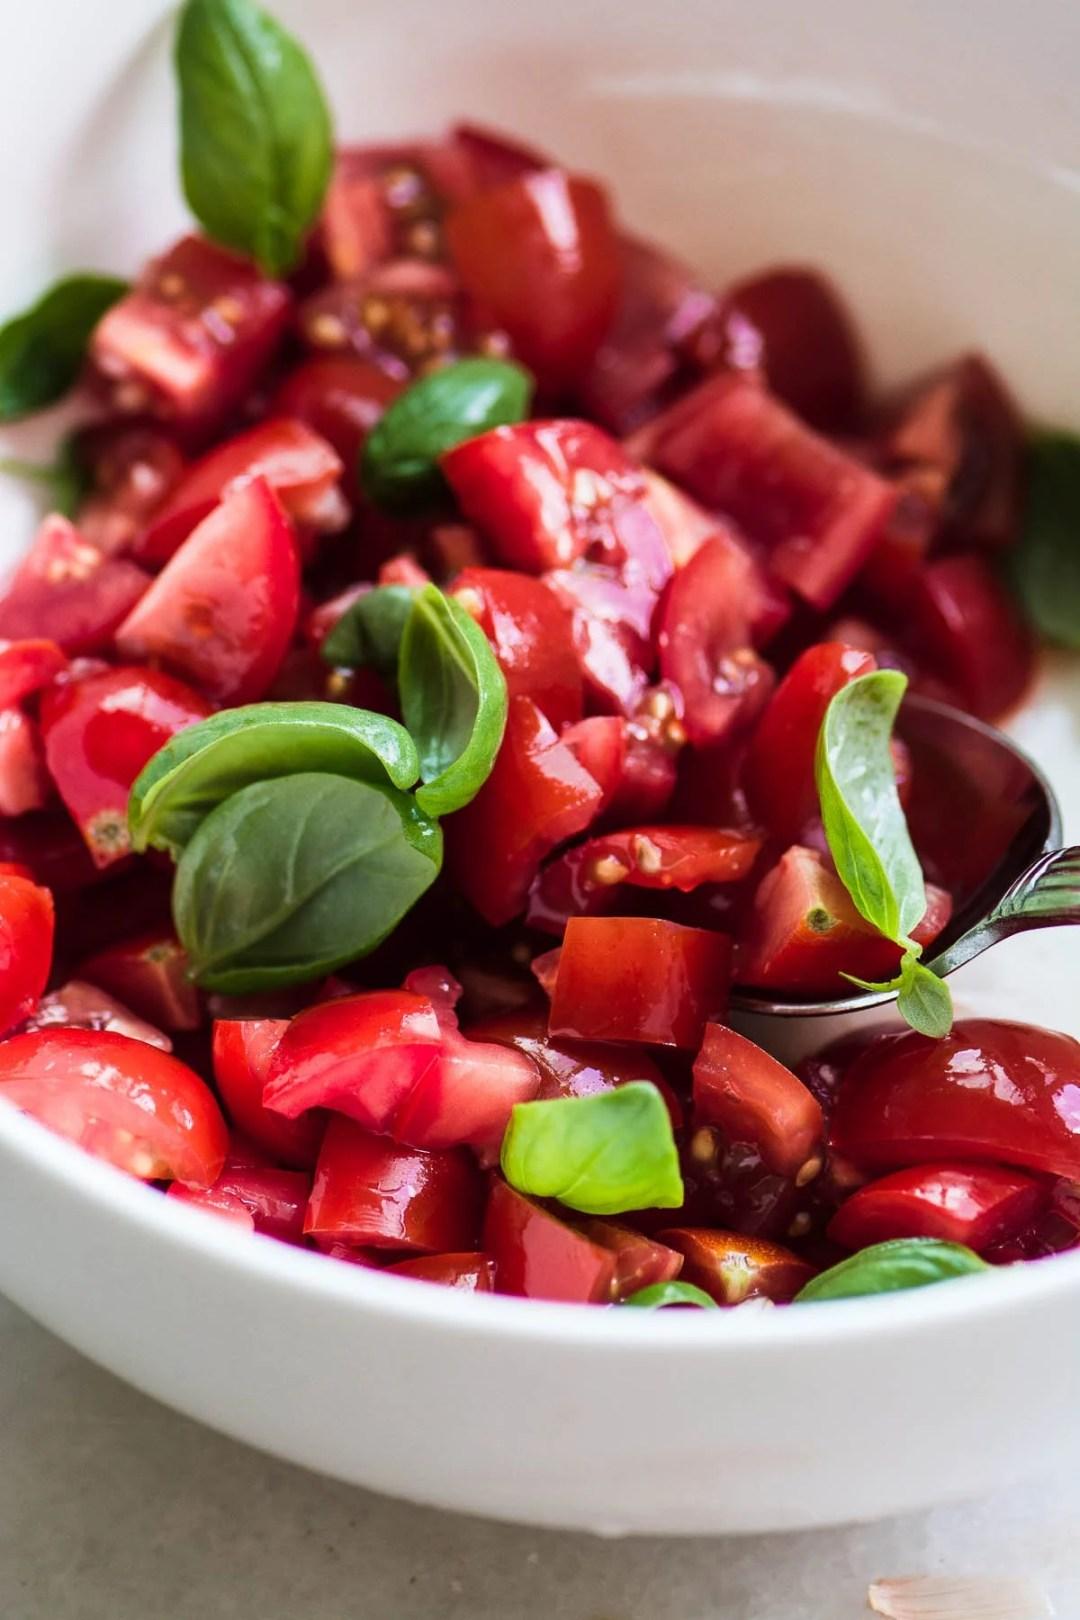 ripe tomatoes in a bowl with basil for pasta alla checca